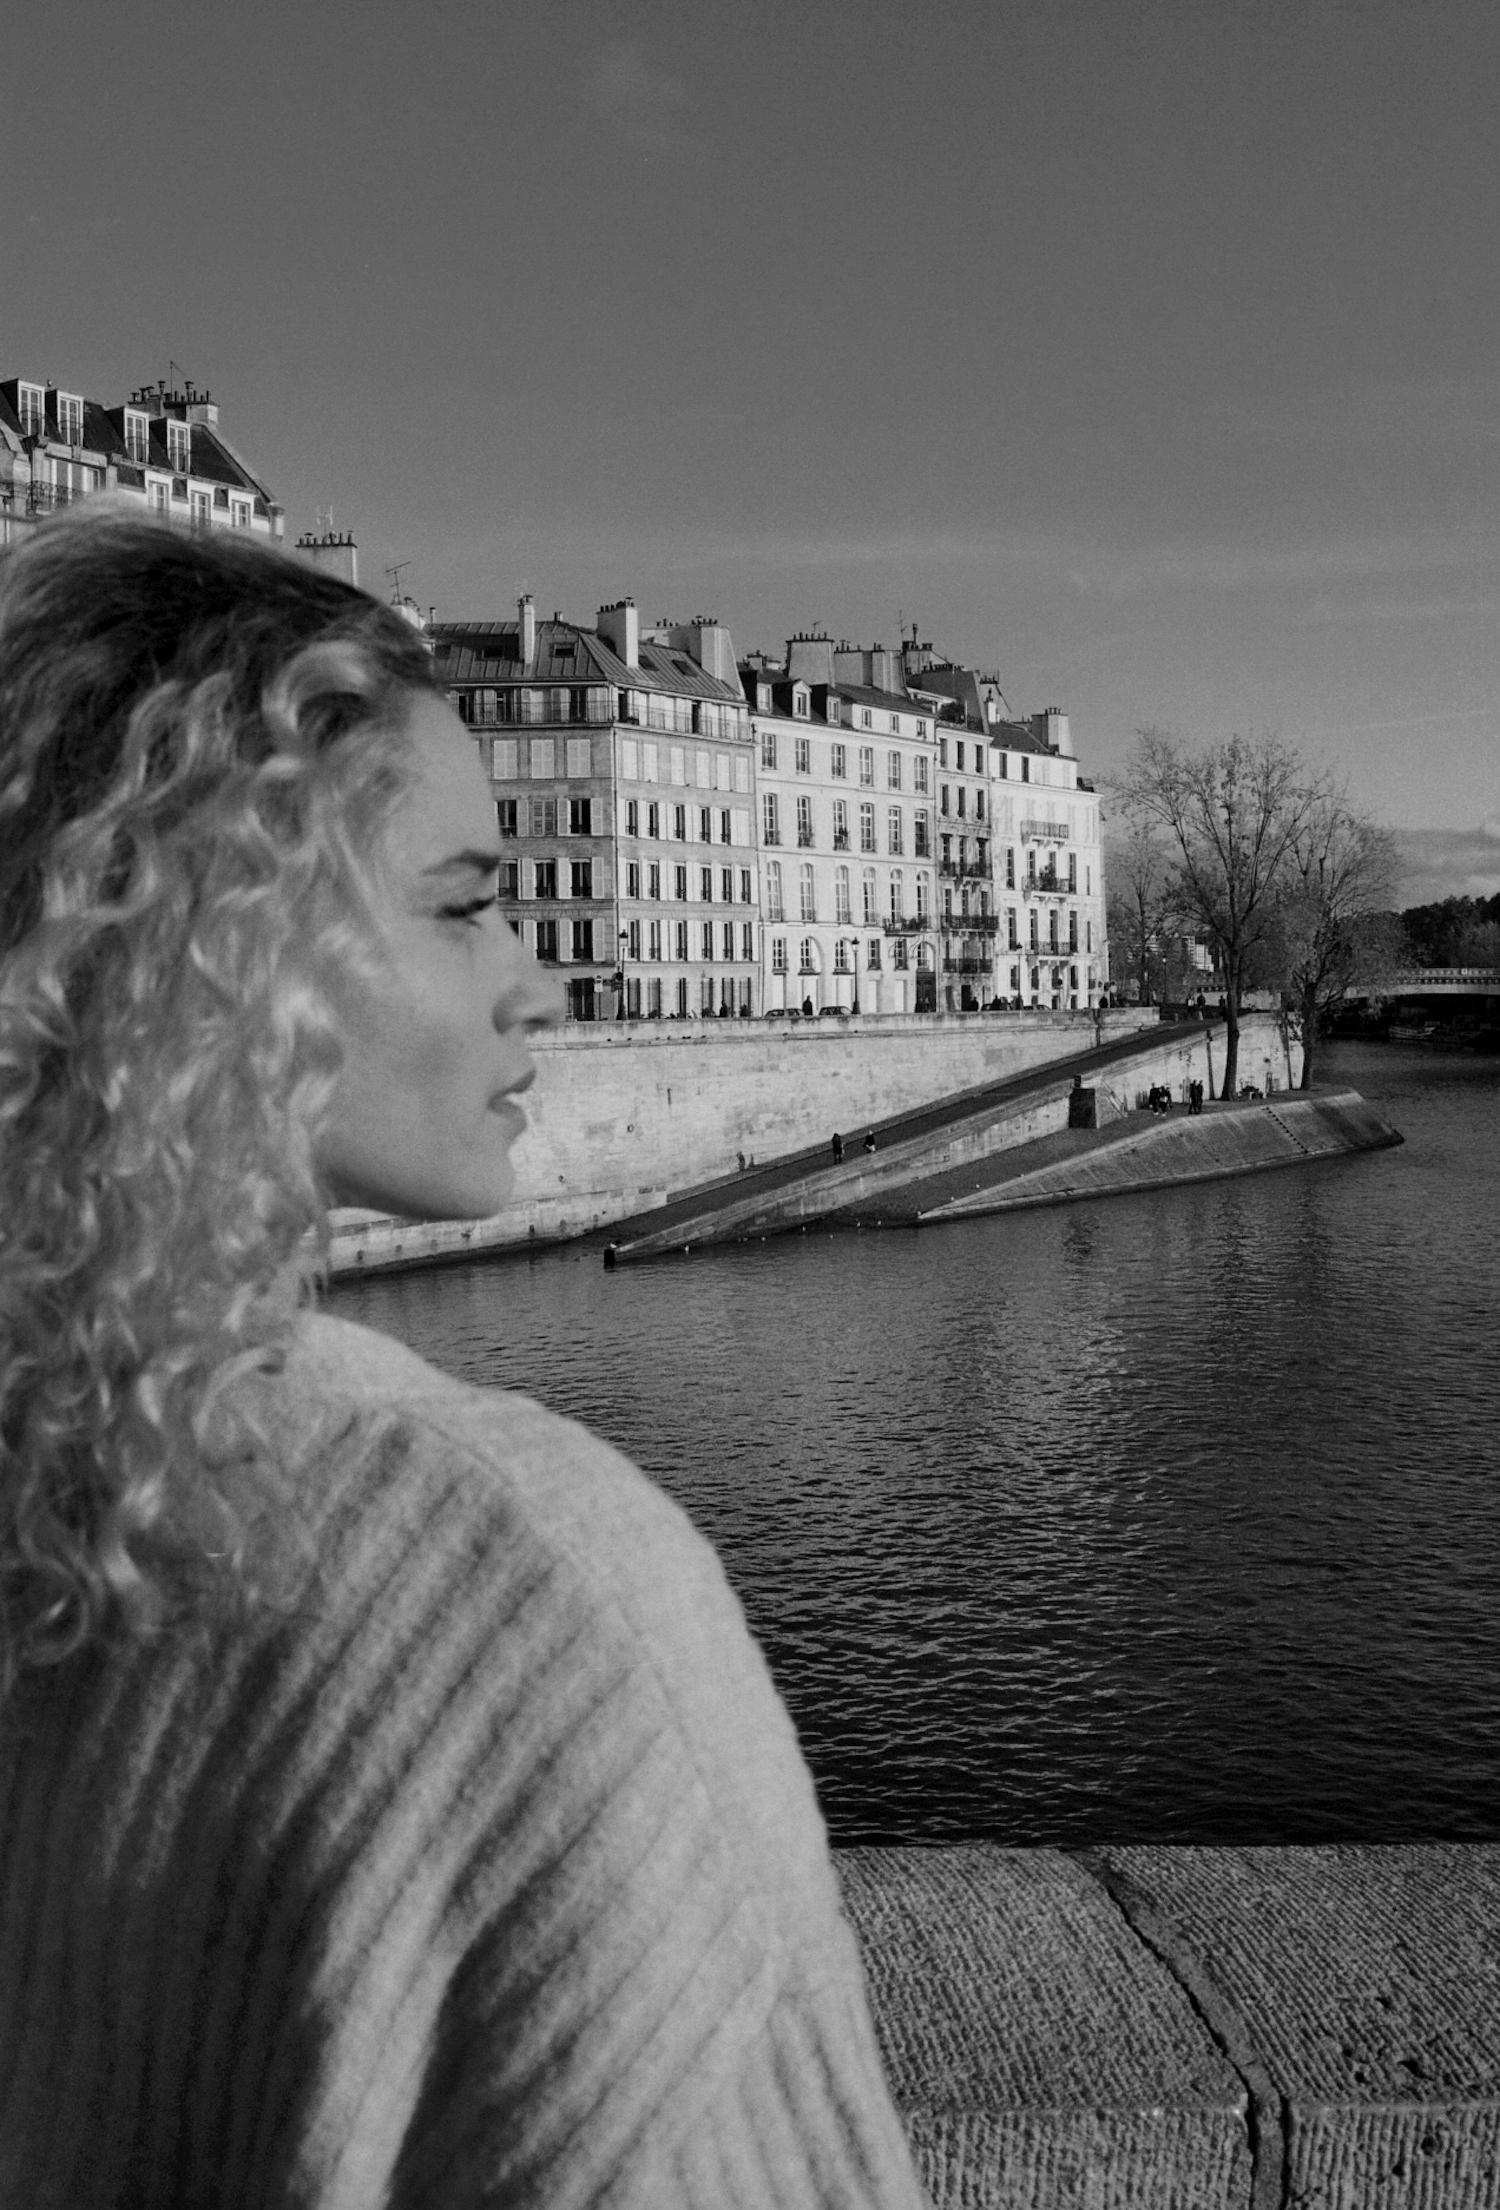 Work, Work Aliénor Gasperi, Alienor Gasperi, Photographe, Photographe freelance, Comédienne, Comédienne freelance, Photographe freelance Paris, Comédienne Paris, Comédienne freelance Paris